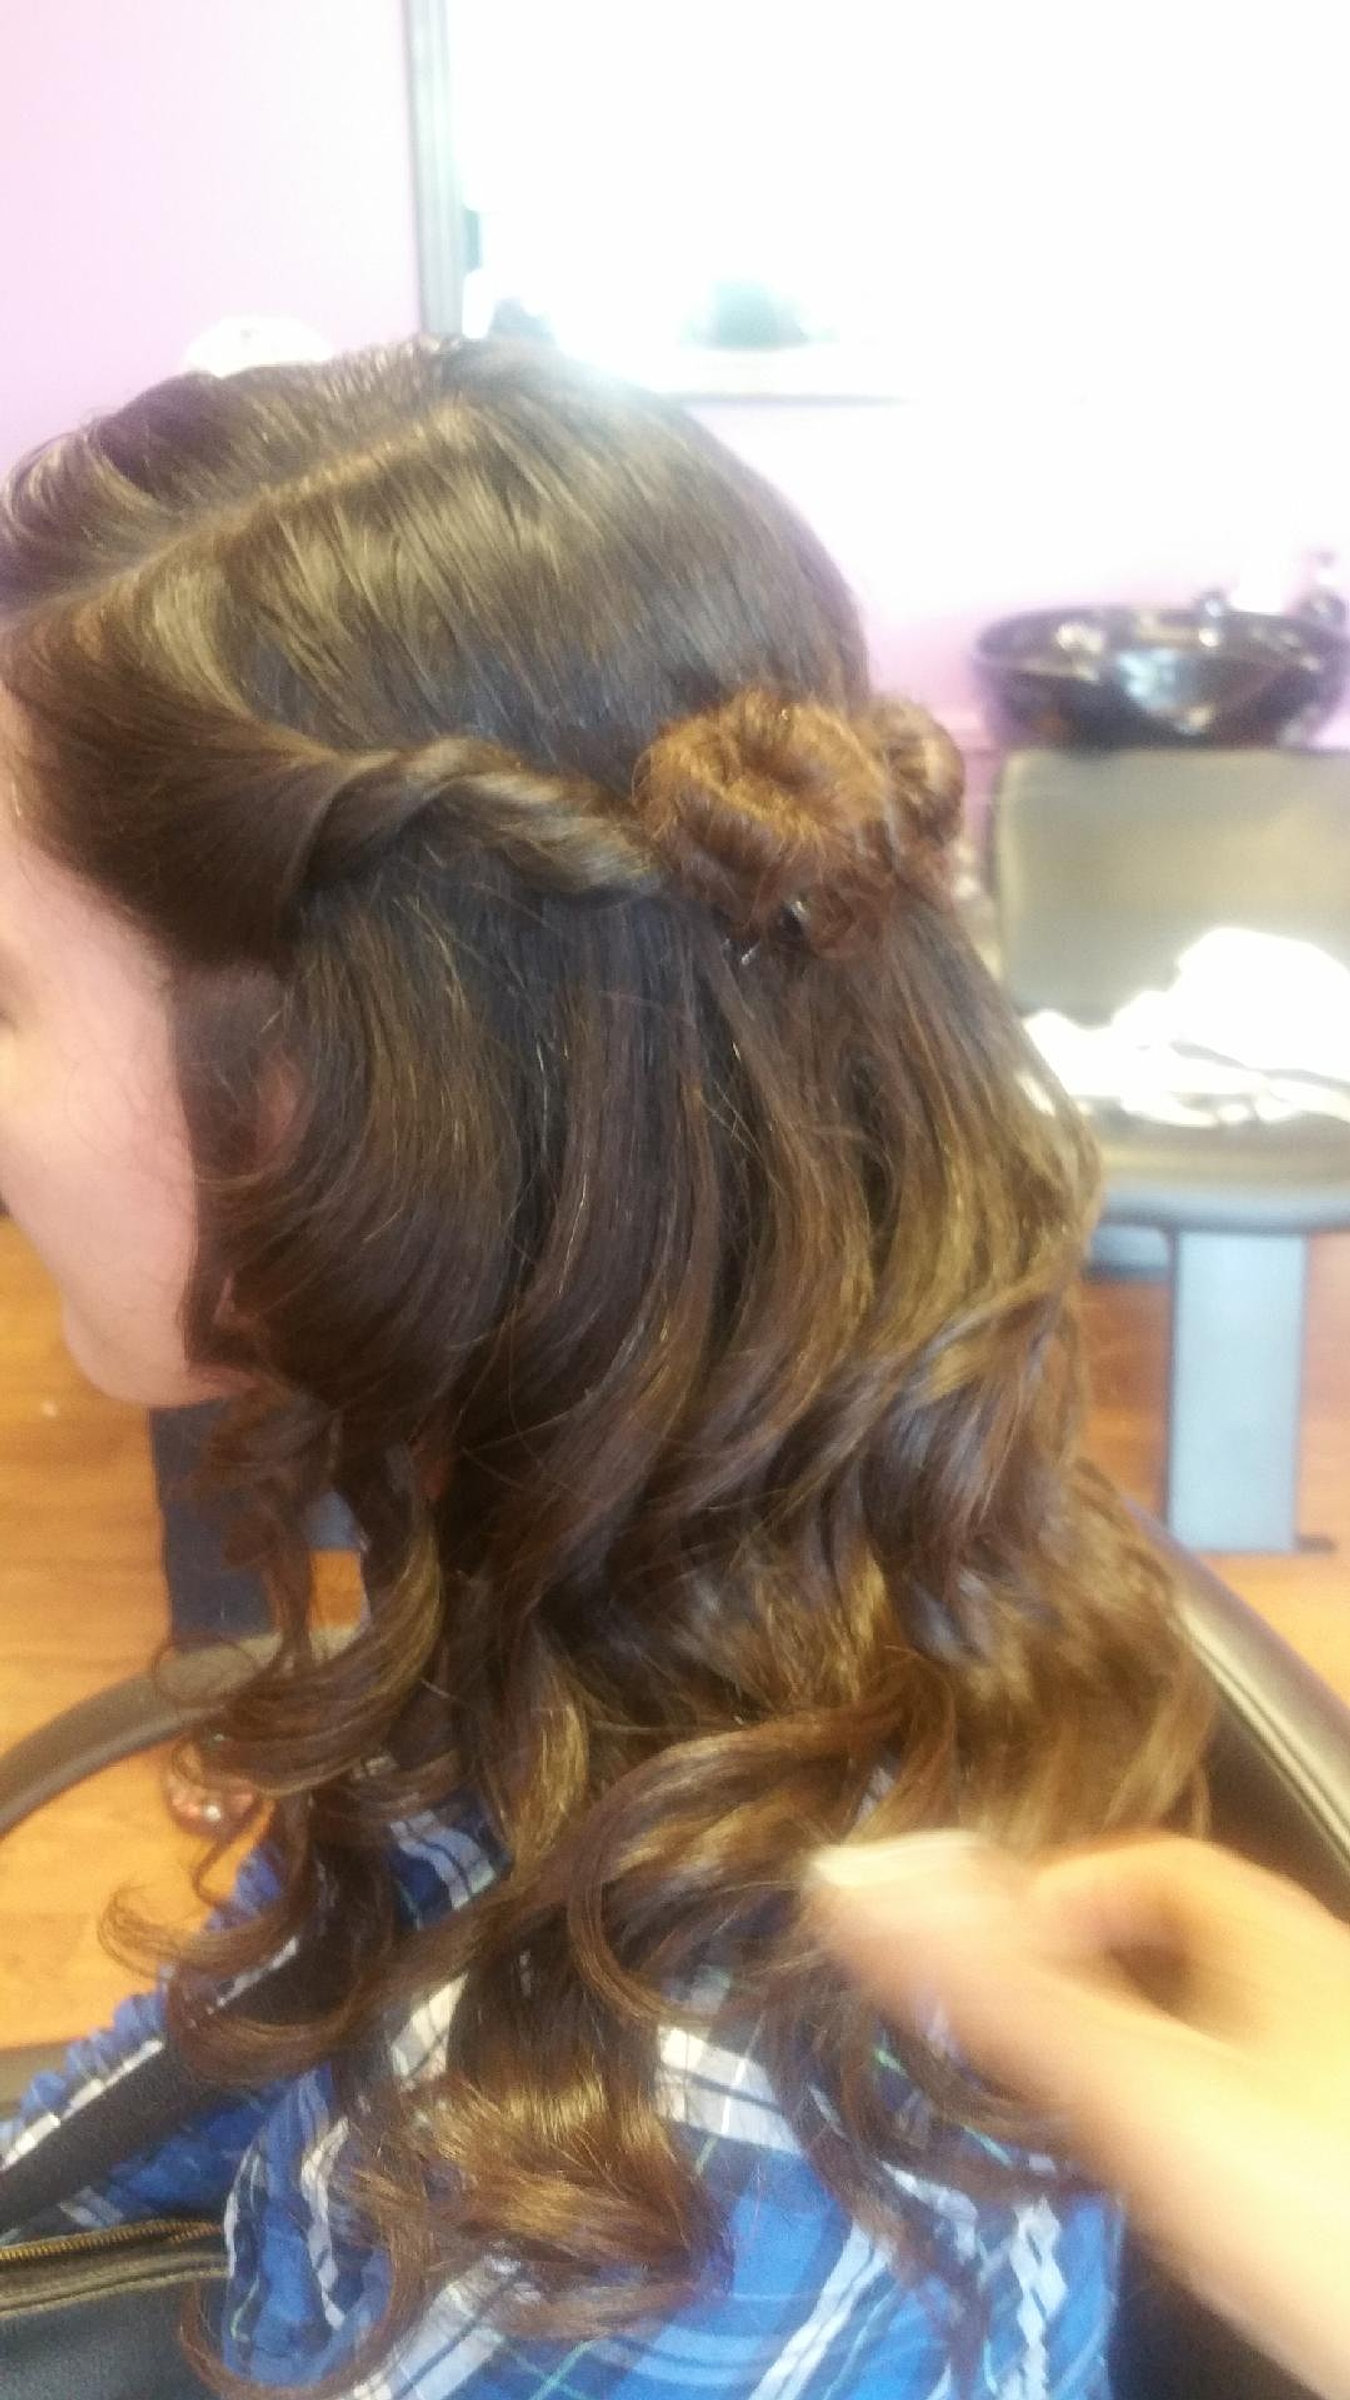 Alimahs beauty salon lathrop ca hair braiding weaves cornrows wigs see what people say hair salon reviews pmusecretfo Images